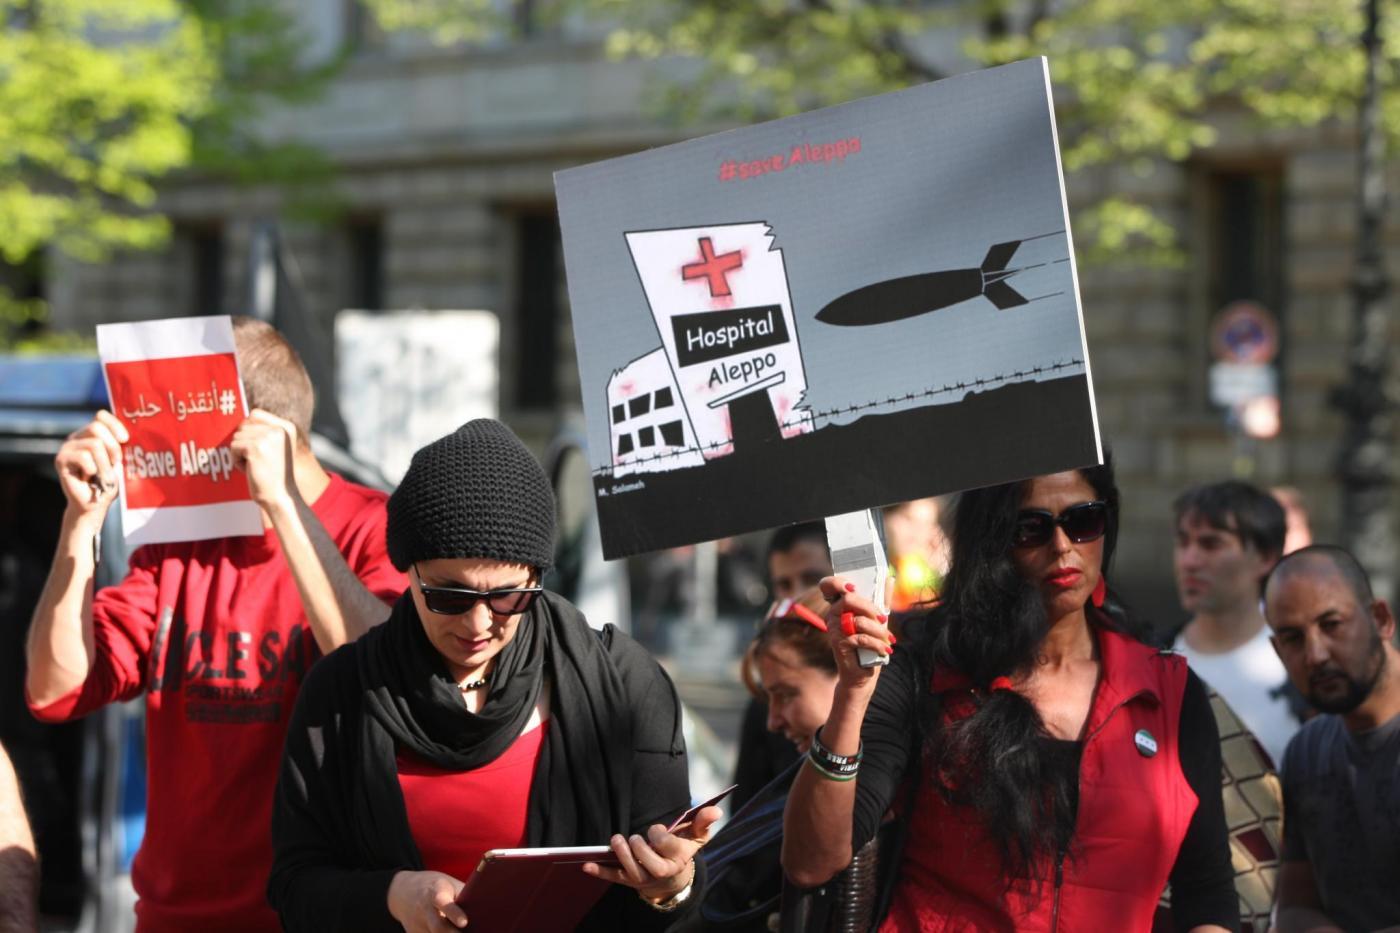 Aleppo-Demonstration Berlin, 2016 (Foto: Thomas Rassloff)